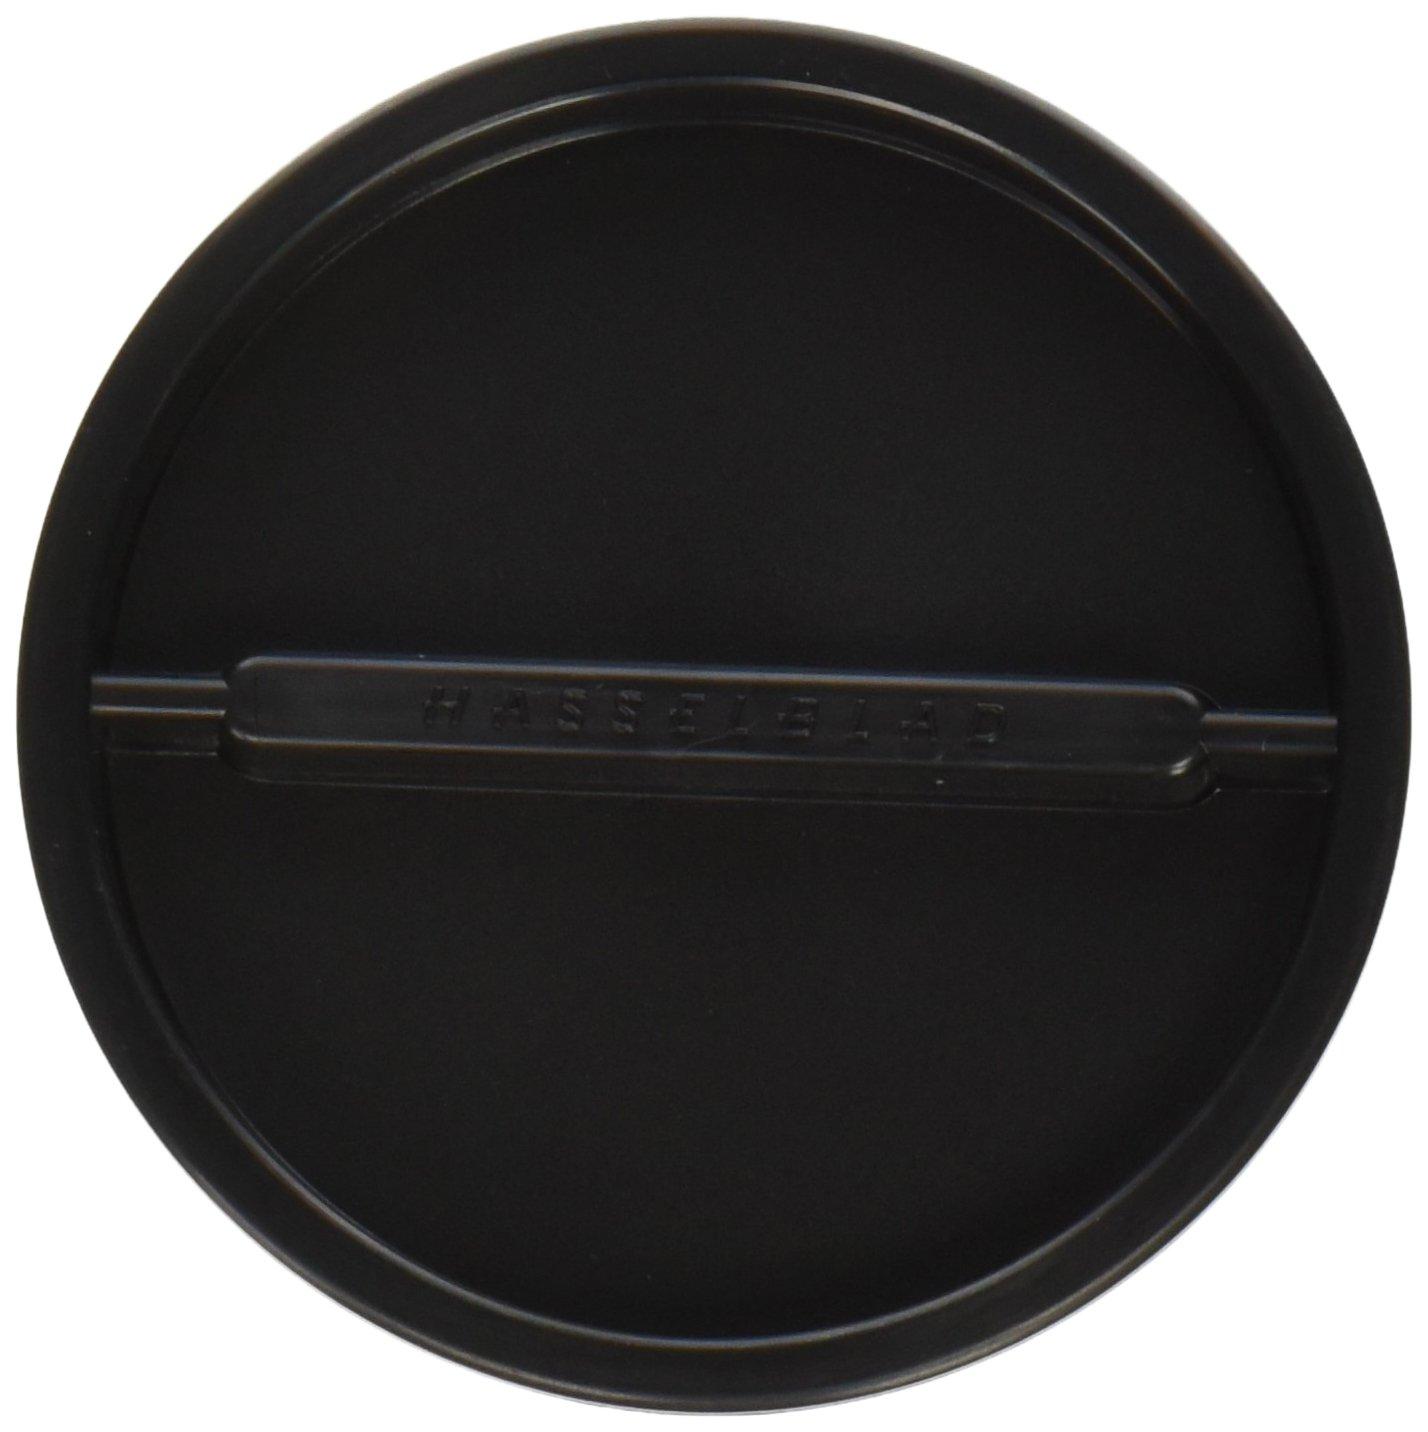 Fotodiox Camera Body Cap for Hasselblad V-mount, Hasselblad 500C, 500C/M, 501C, 501C/M, 903, 905 SWC, 500 EL, EL/M, ELX, 553 ELX, ELD 11-HB-Cap-Body